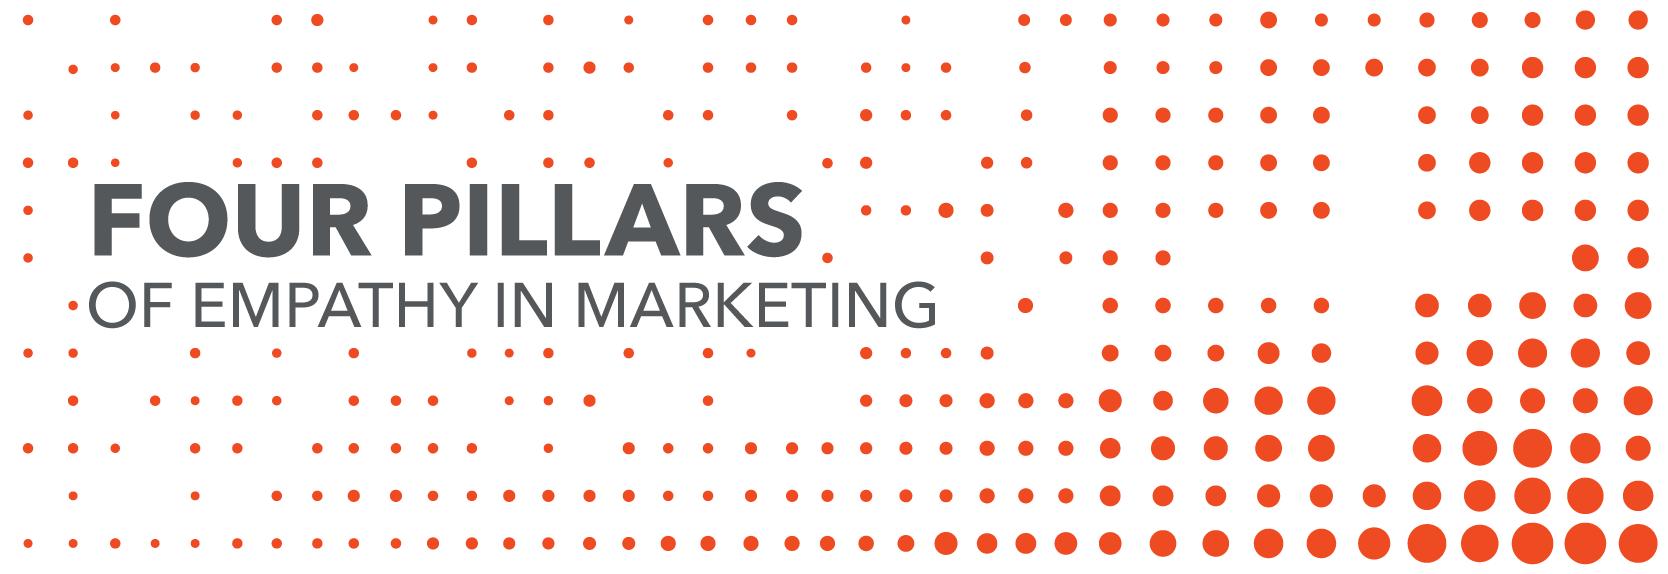 four pillars of empathy in marketing